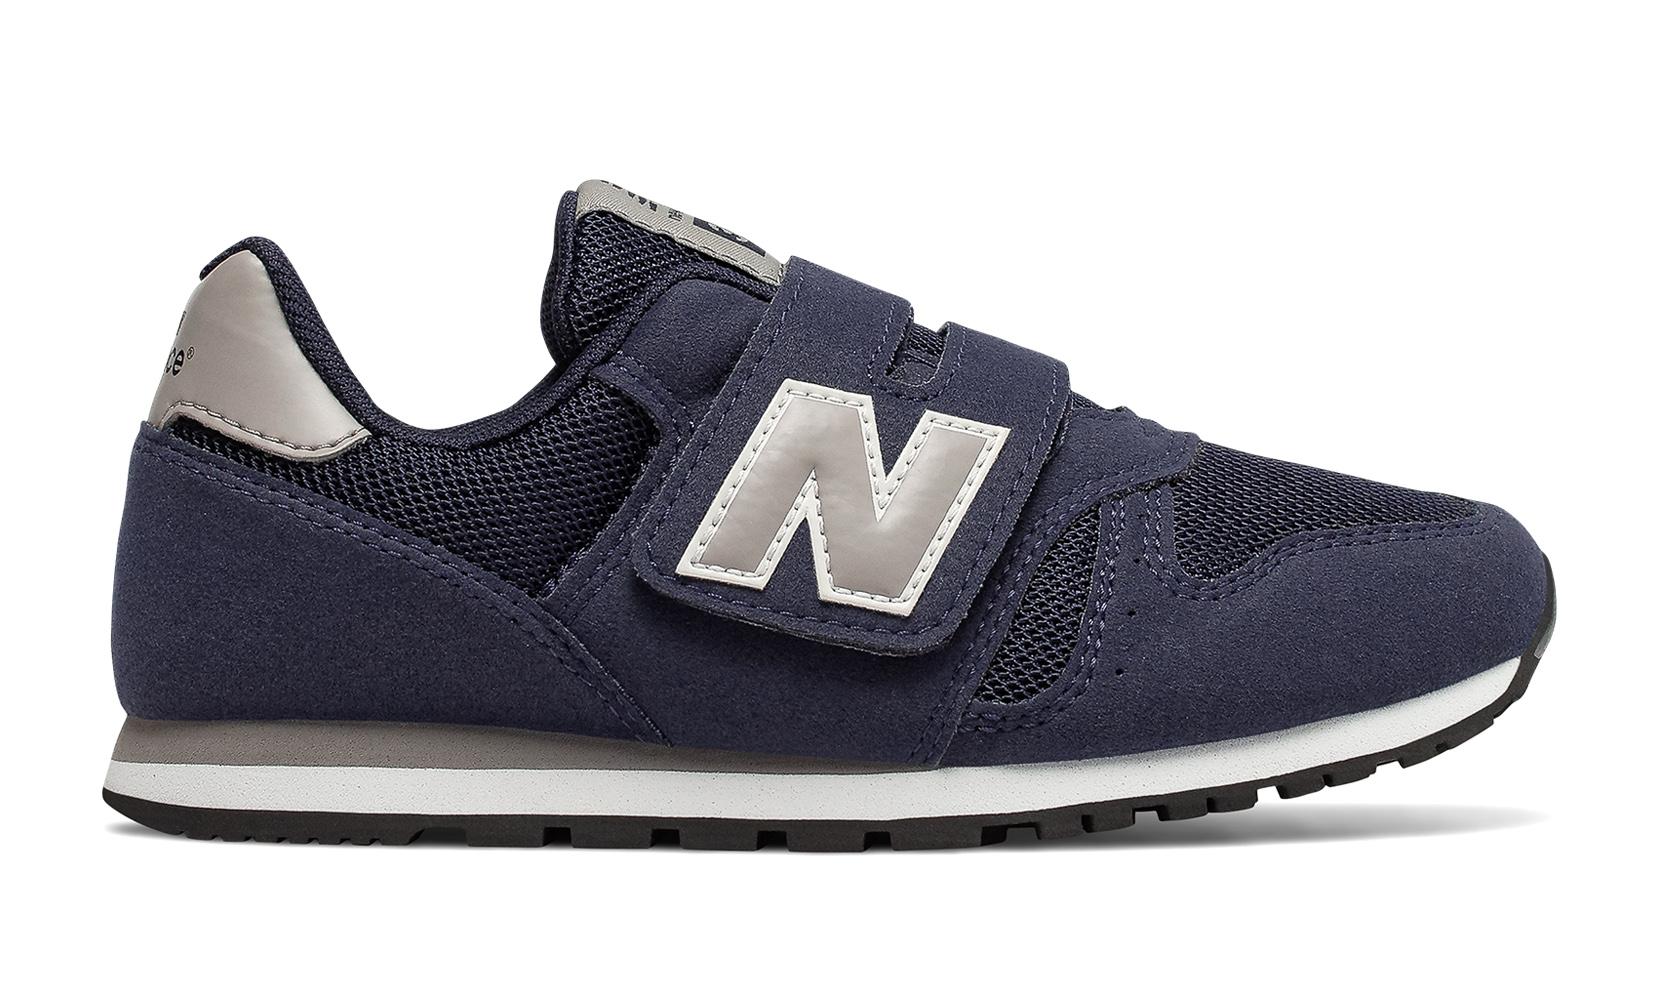 New Balance 373 YV373NV | New Balance